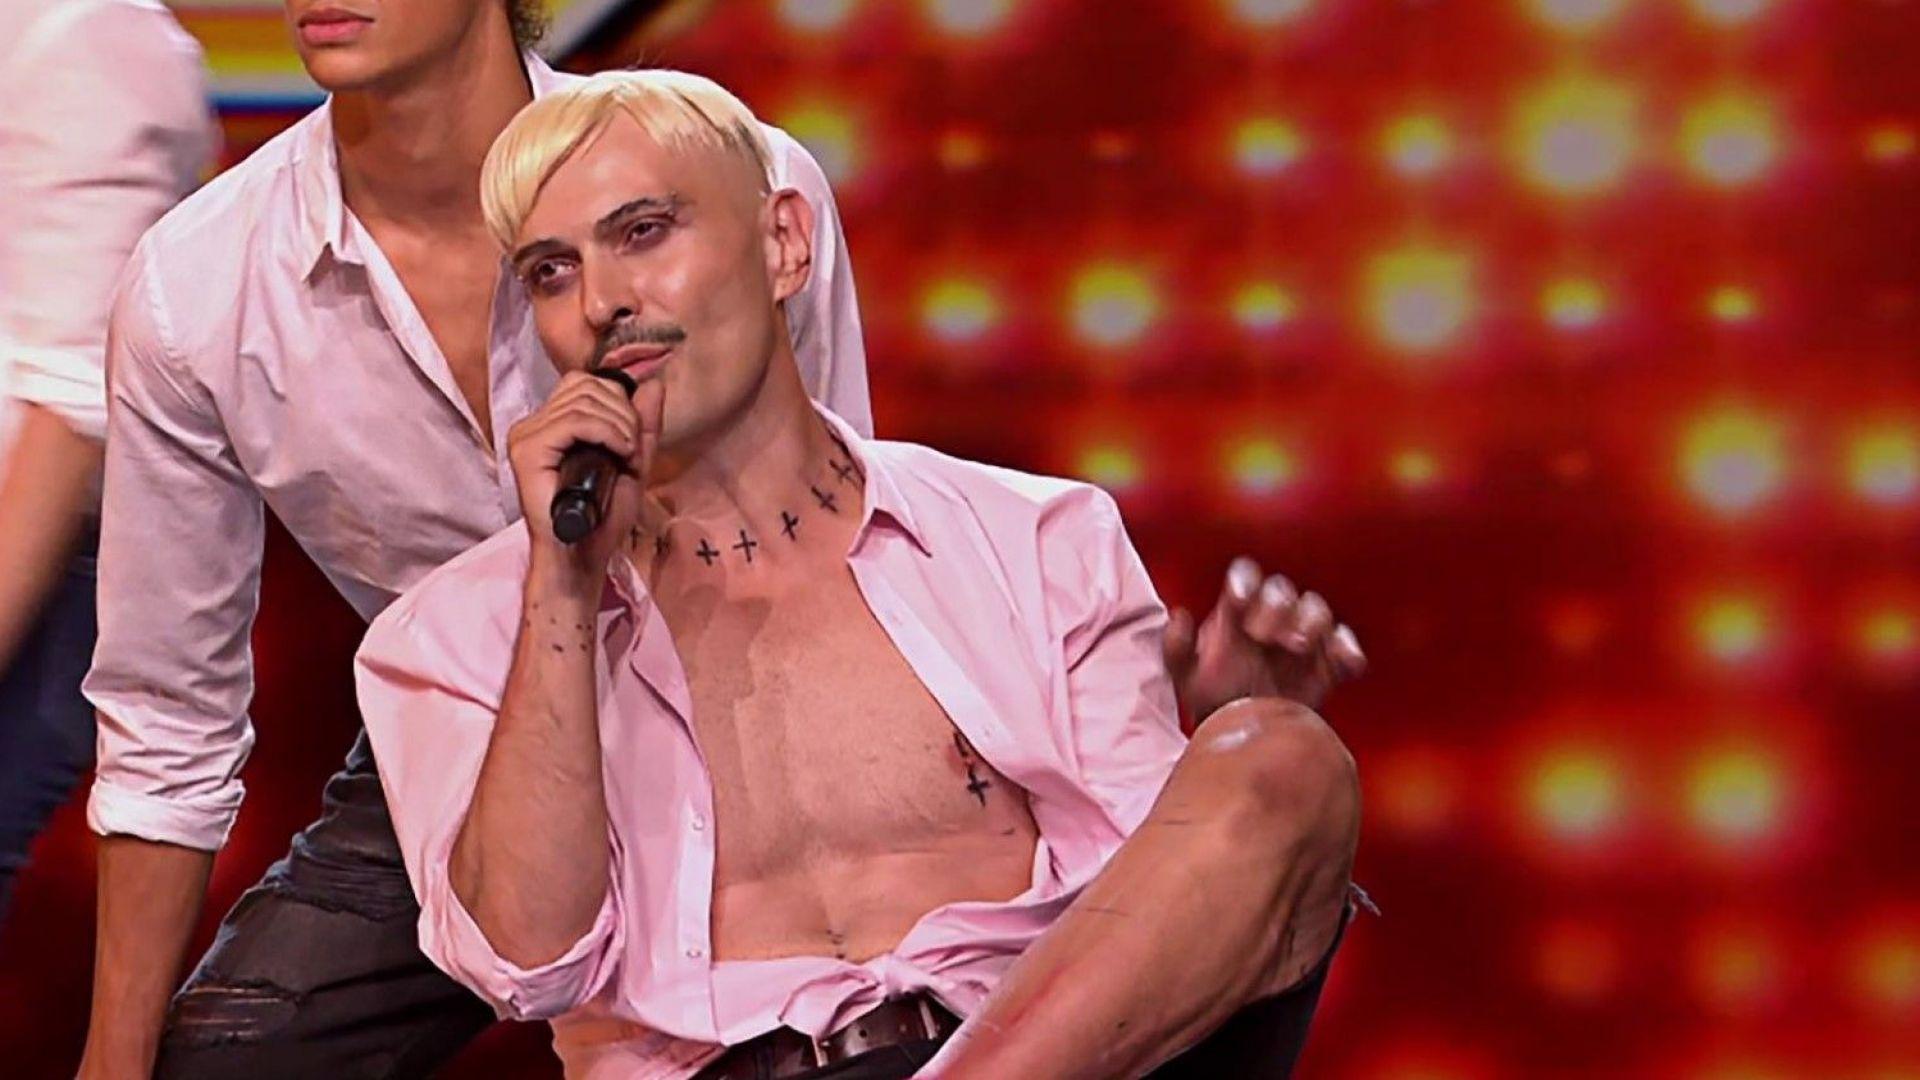 Иво Димчев пред Dir.bg: Публиката на X Factor не ми е никакъв критерий